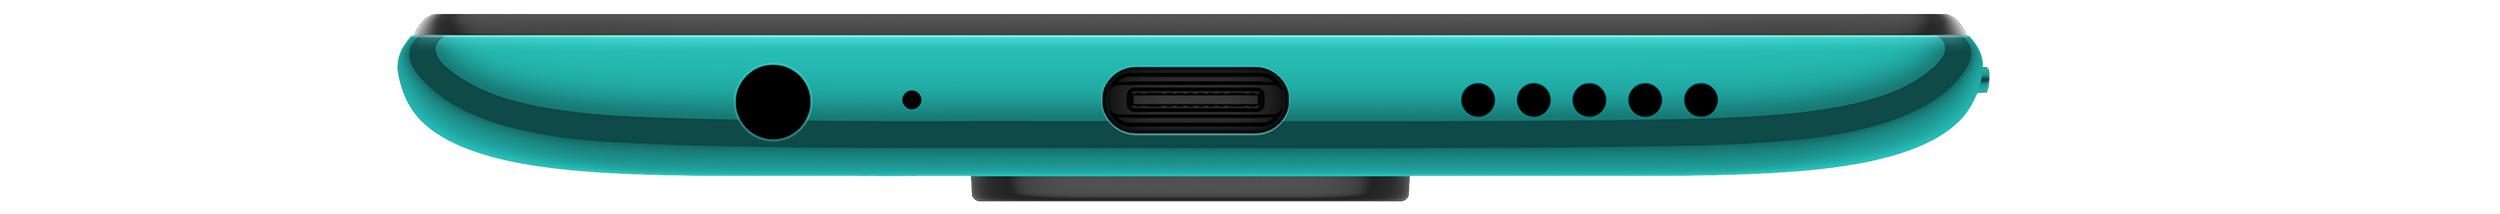 Redmi Note 9 okostelefon (Global) - 4+128GB, Forest Green